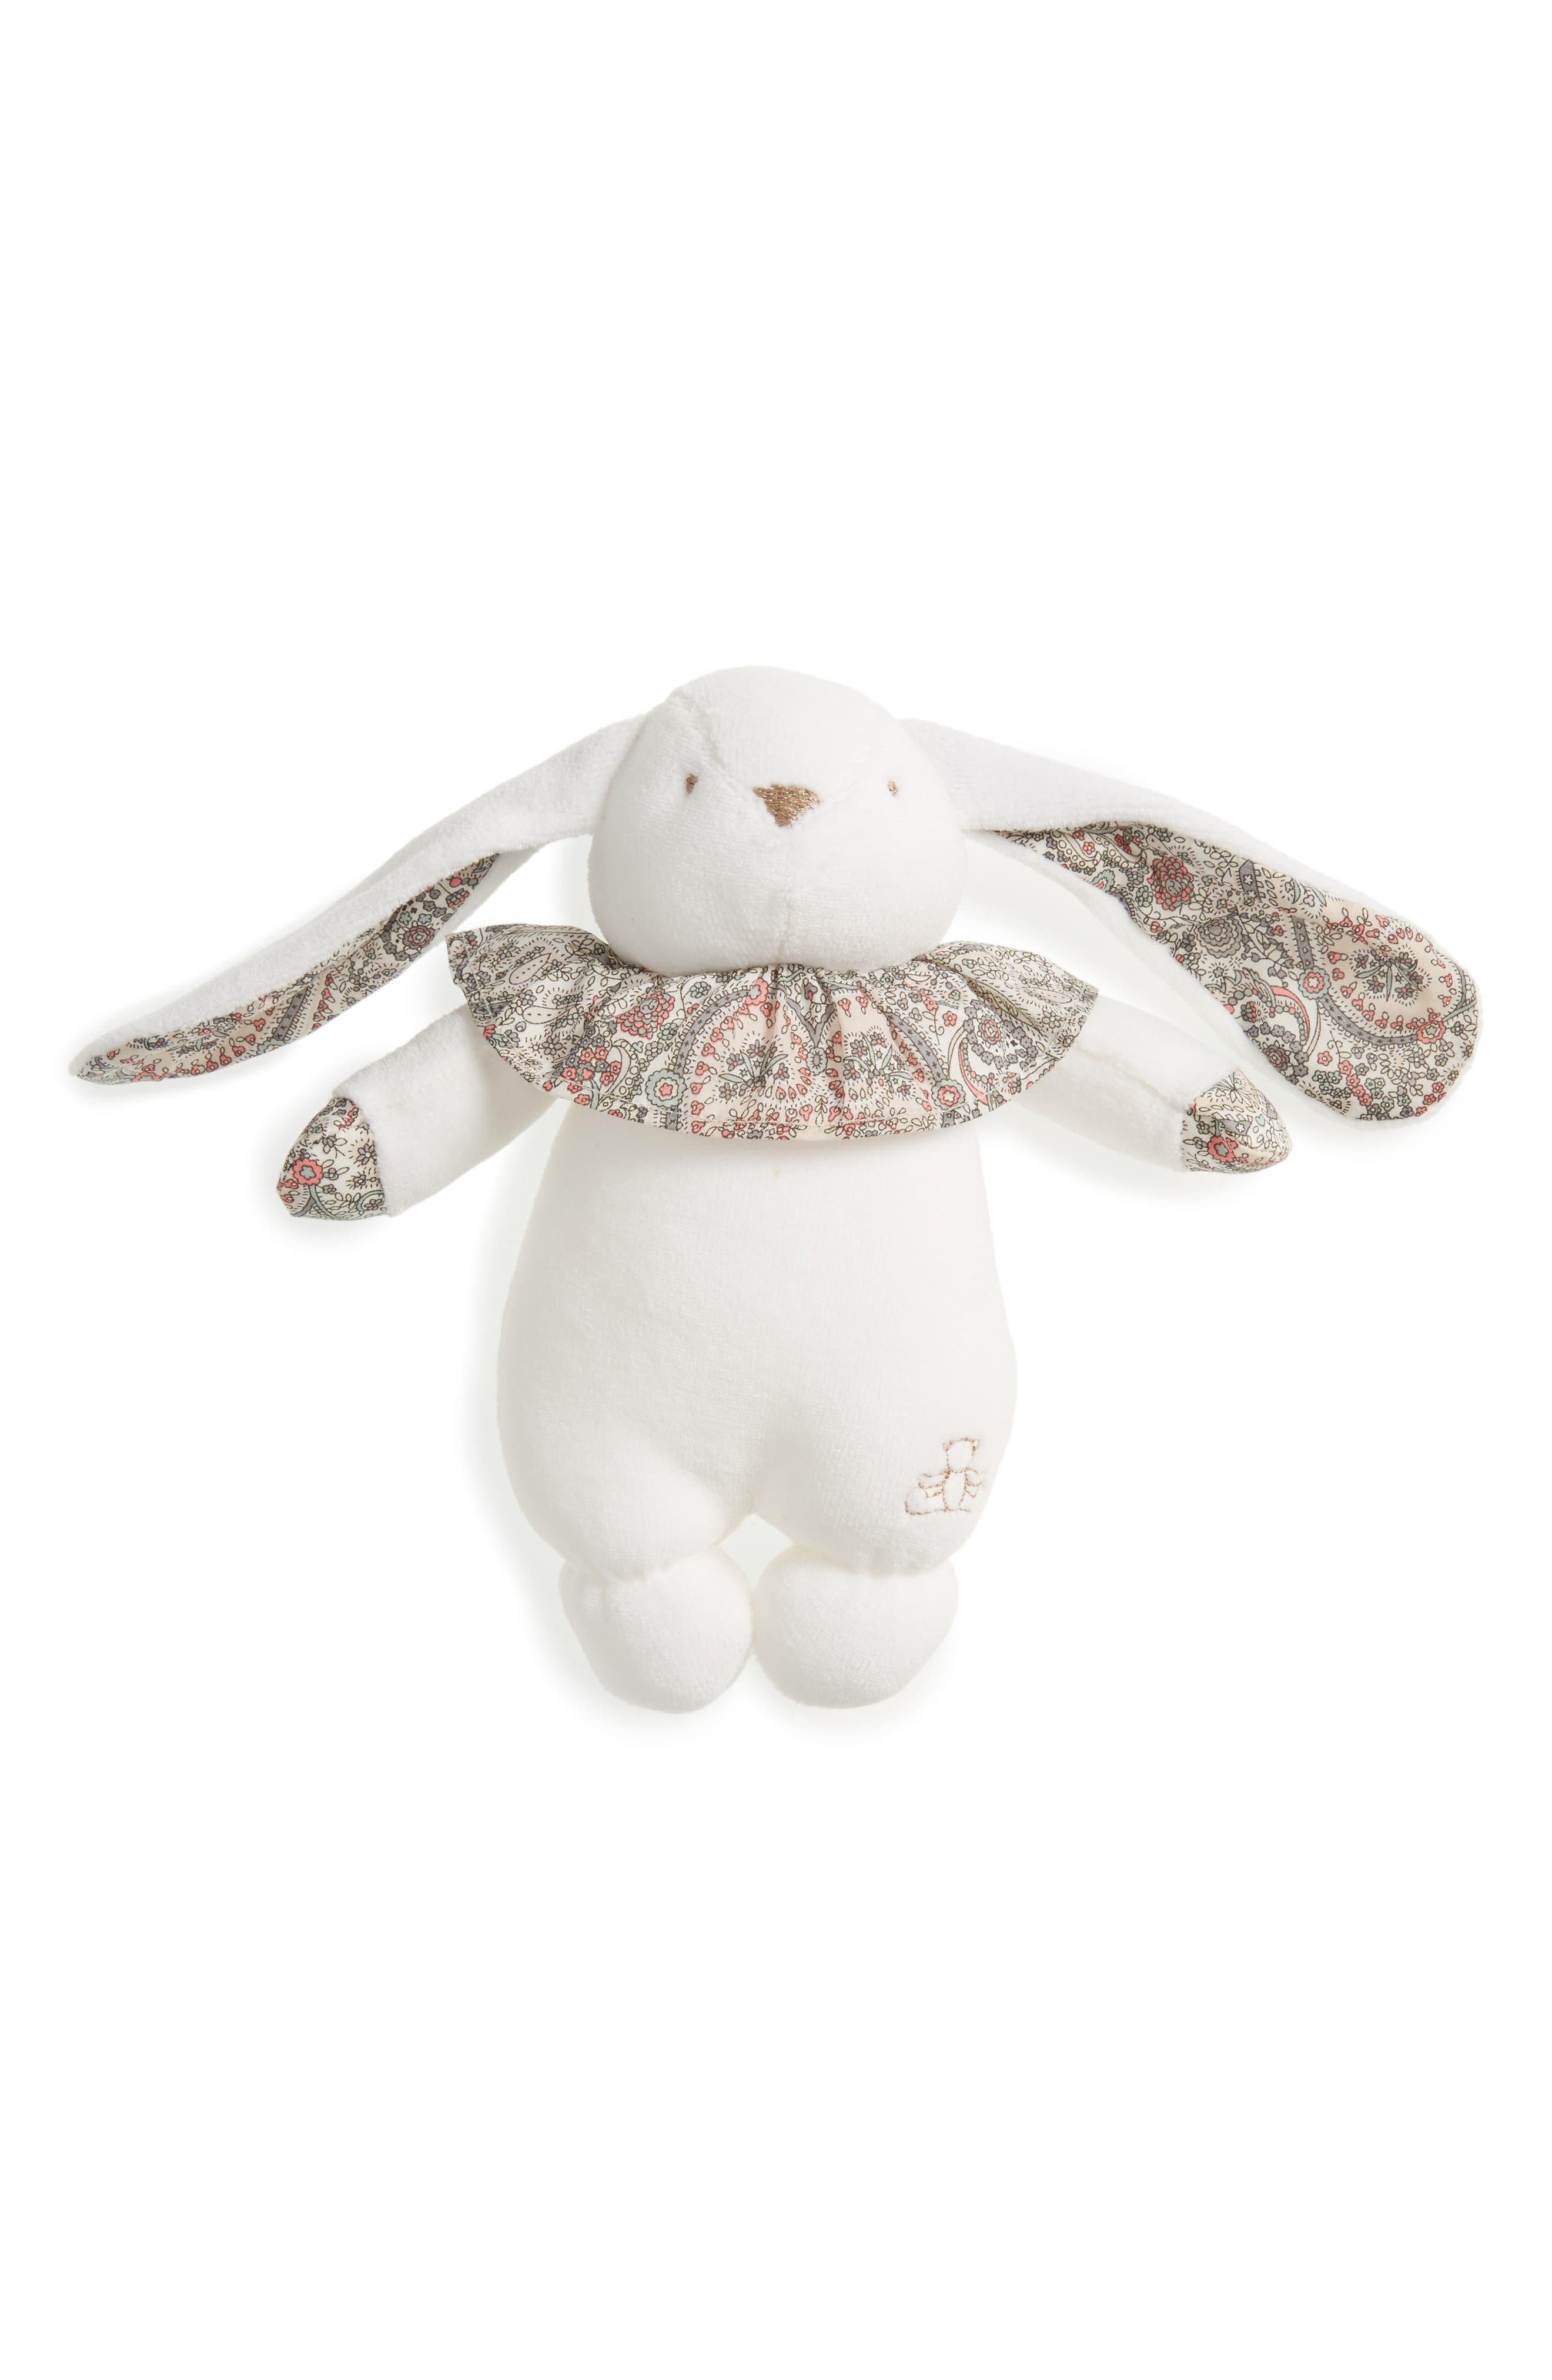 x Liberty of London Rabbit Rattle,                         Main,                         color, Grey